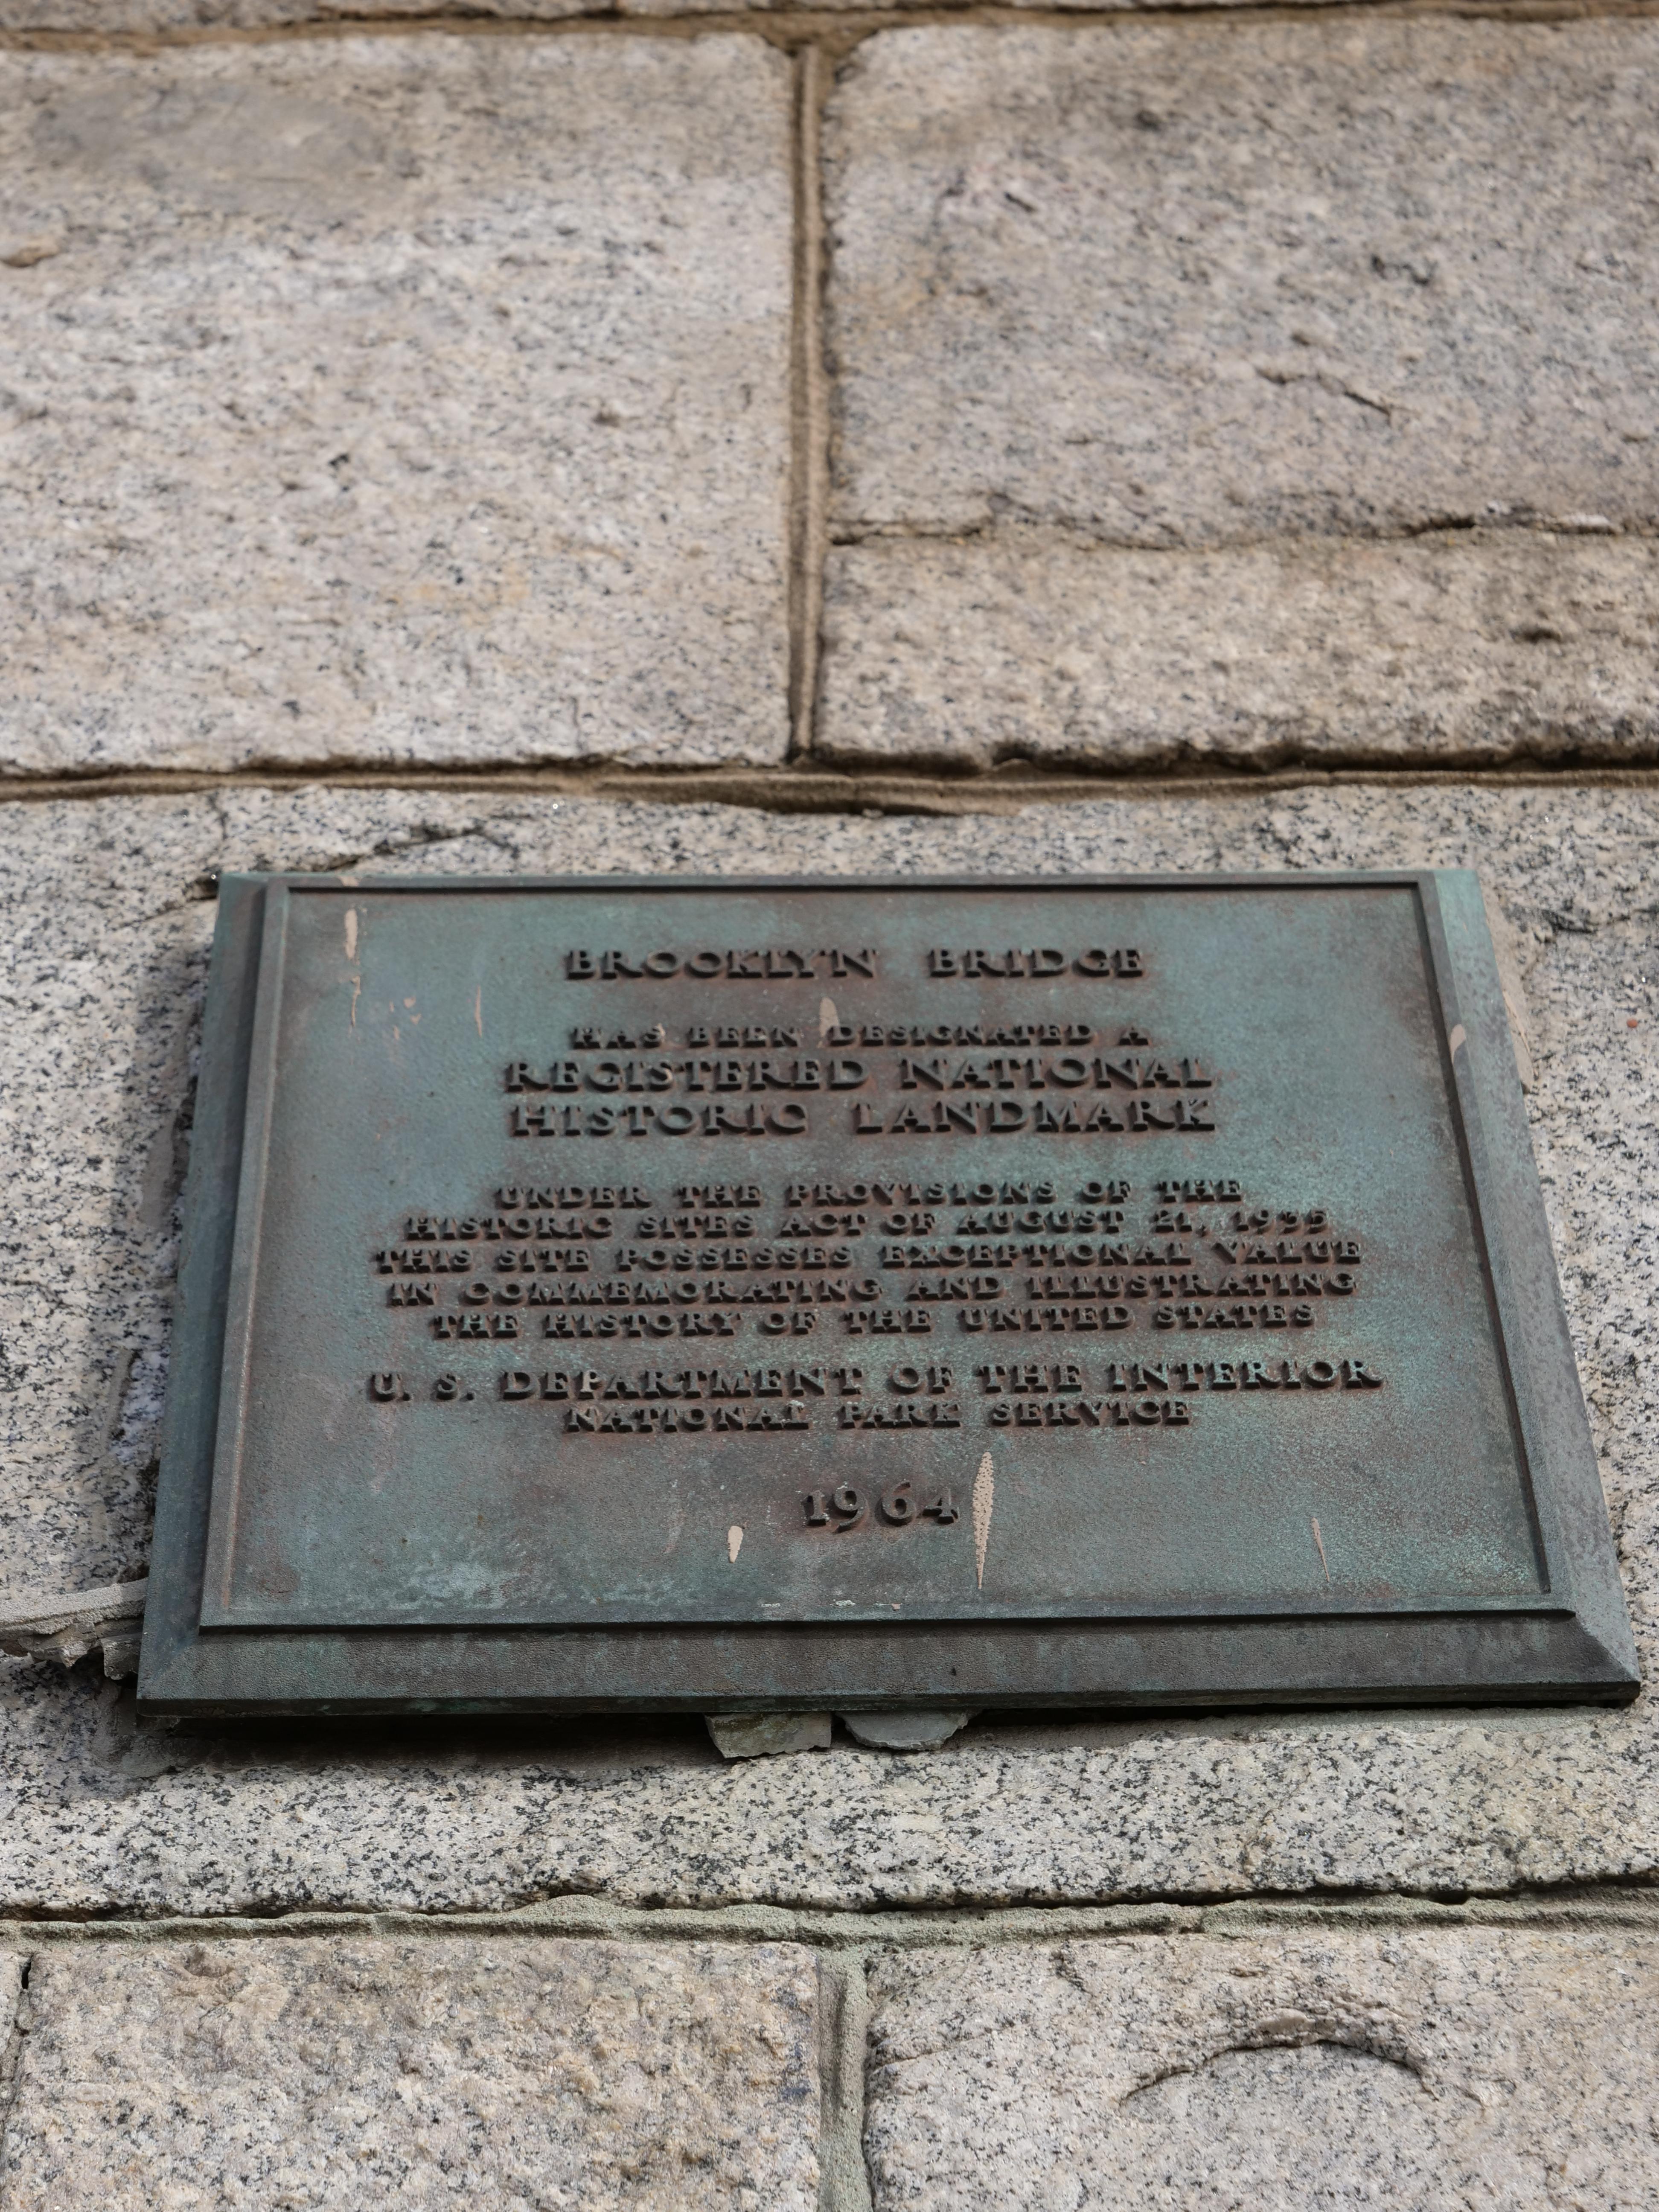 History of the Brooklyn Bridge 1869 plaque